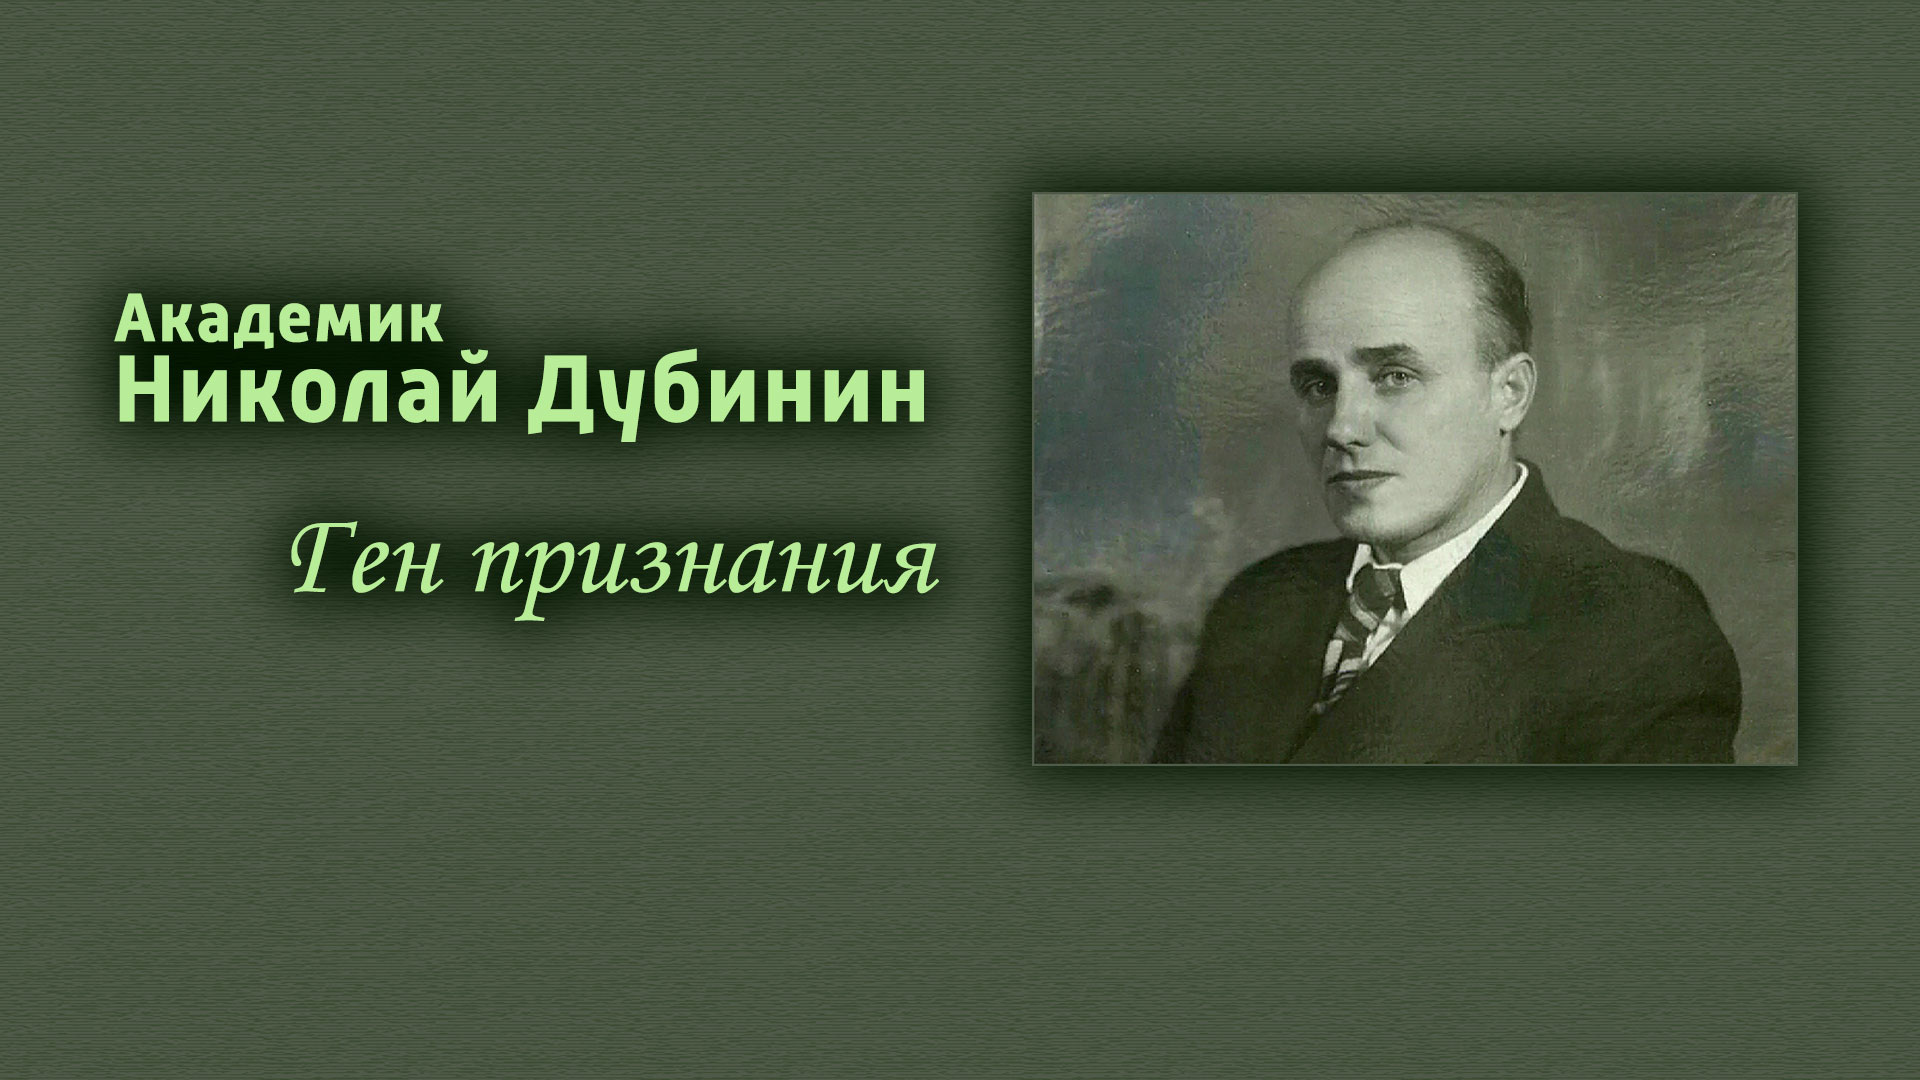 Академик Николай Дубинин. Ген признания